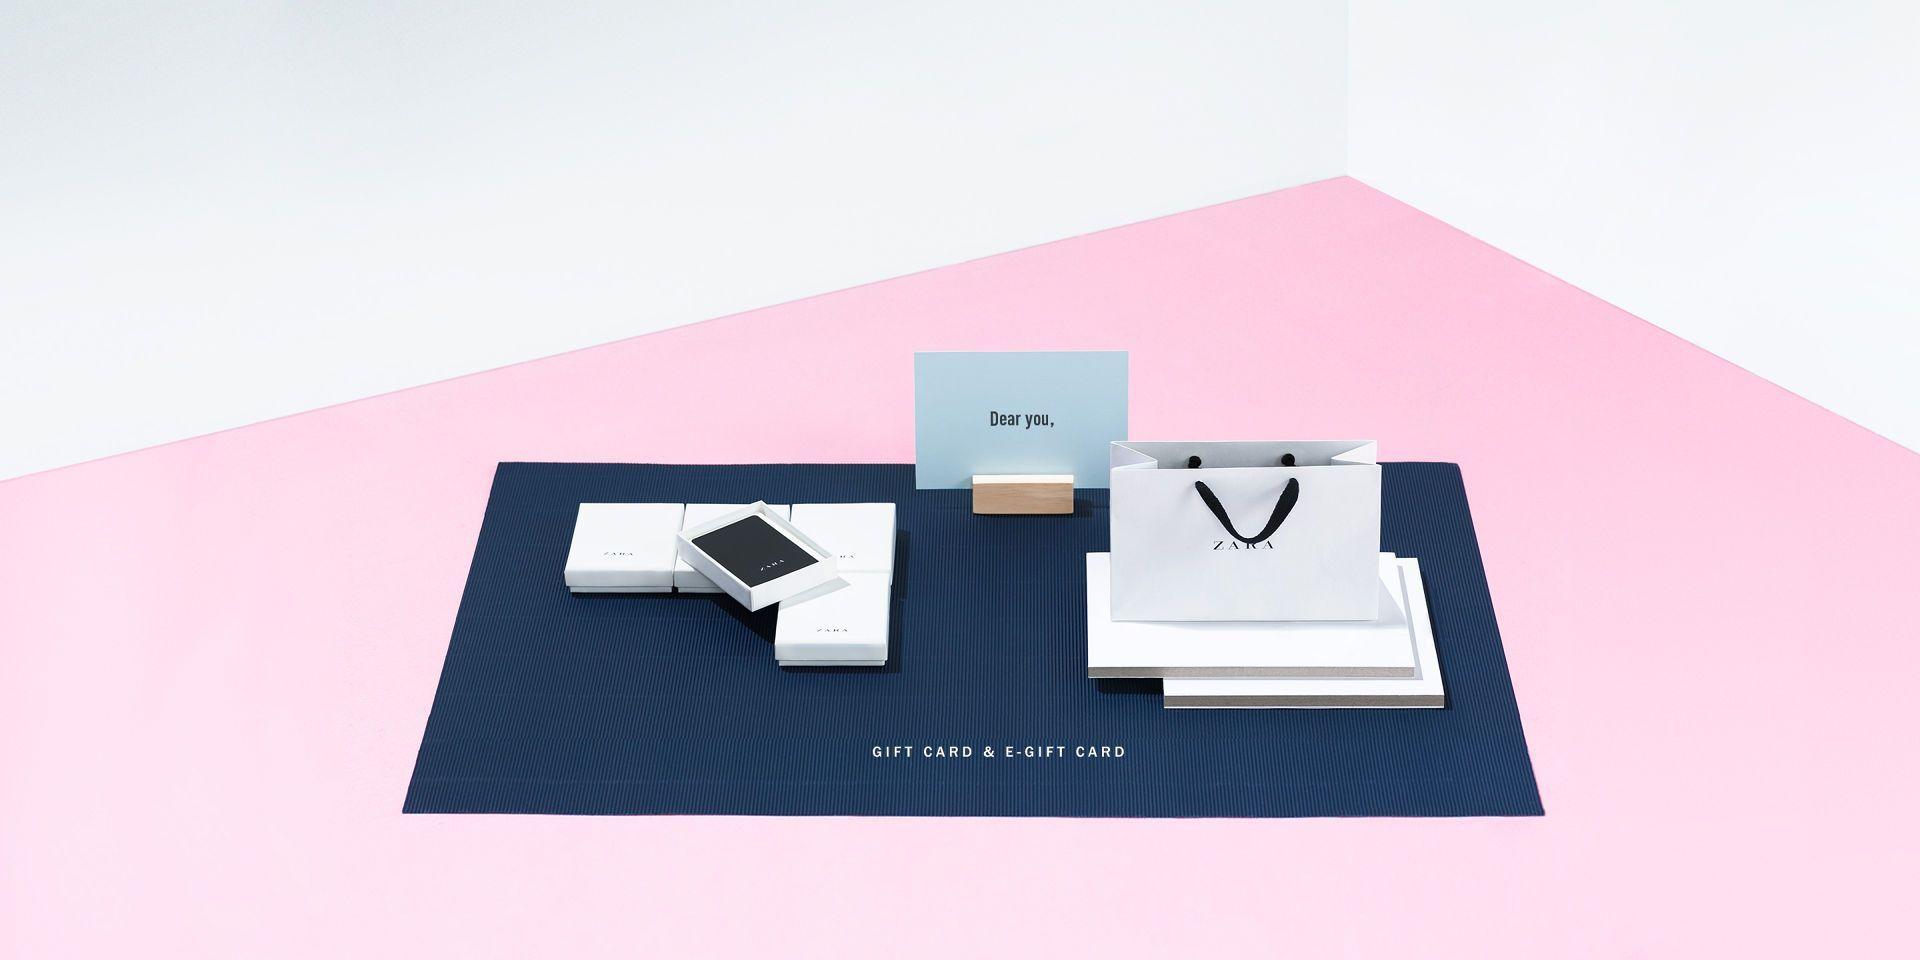 Gift card info in 2020 gift card zara gifts gift